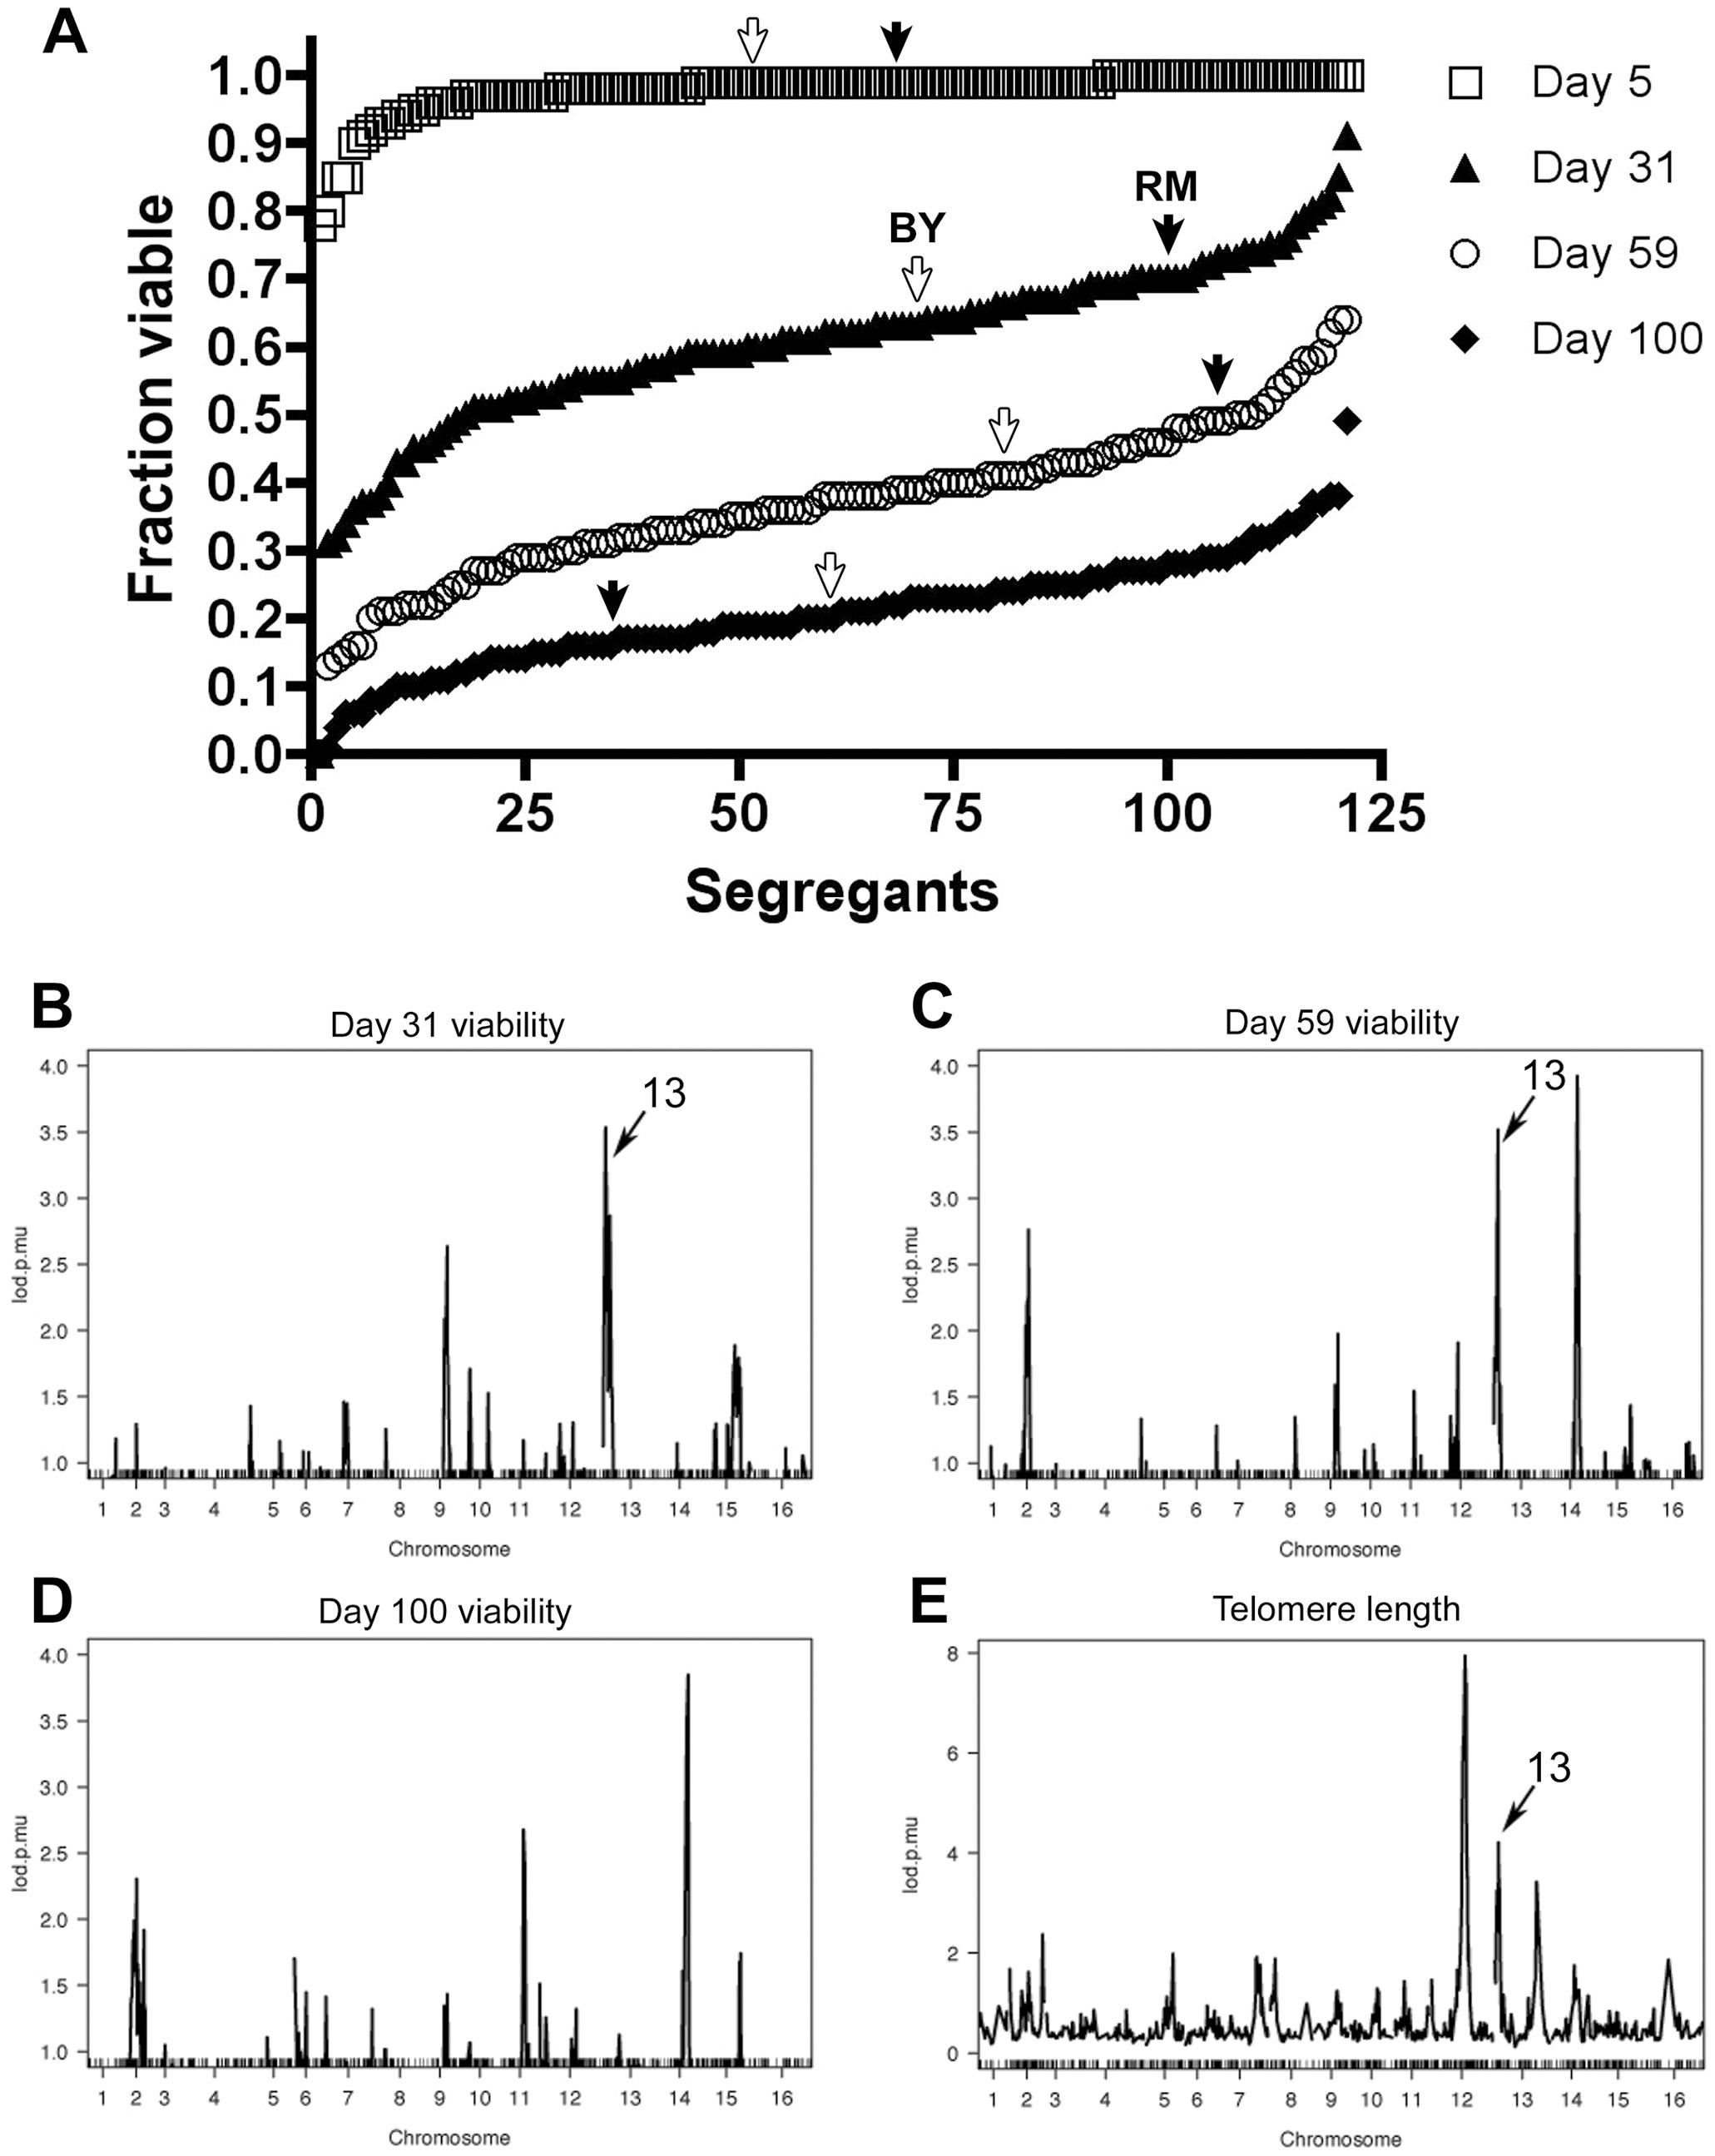 Genomic linkage of chronological lifespan in <i>S. cerevisiae</i> segregants.